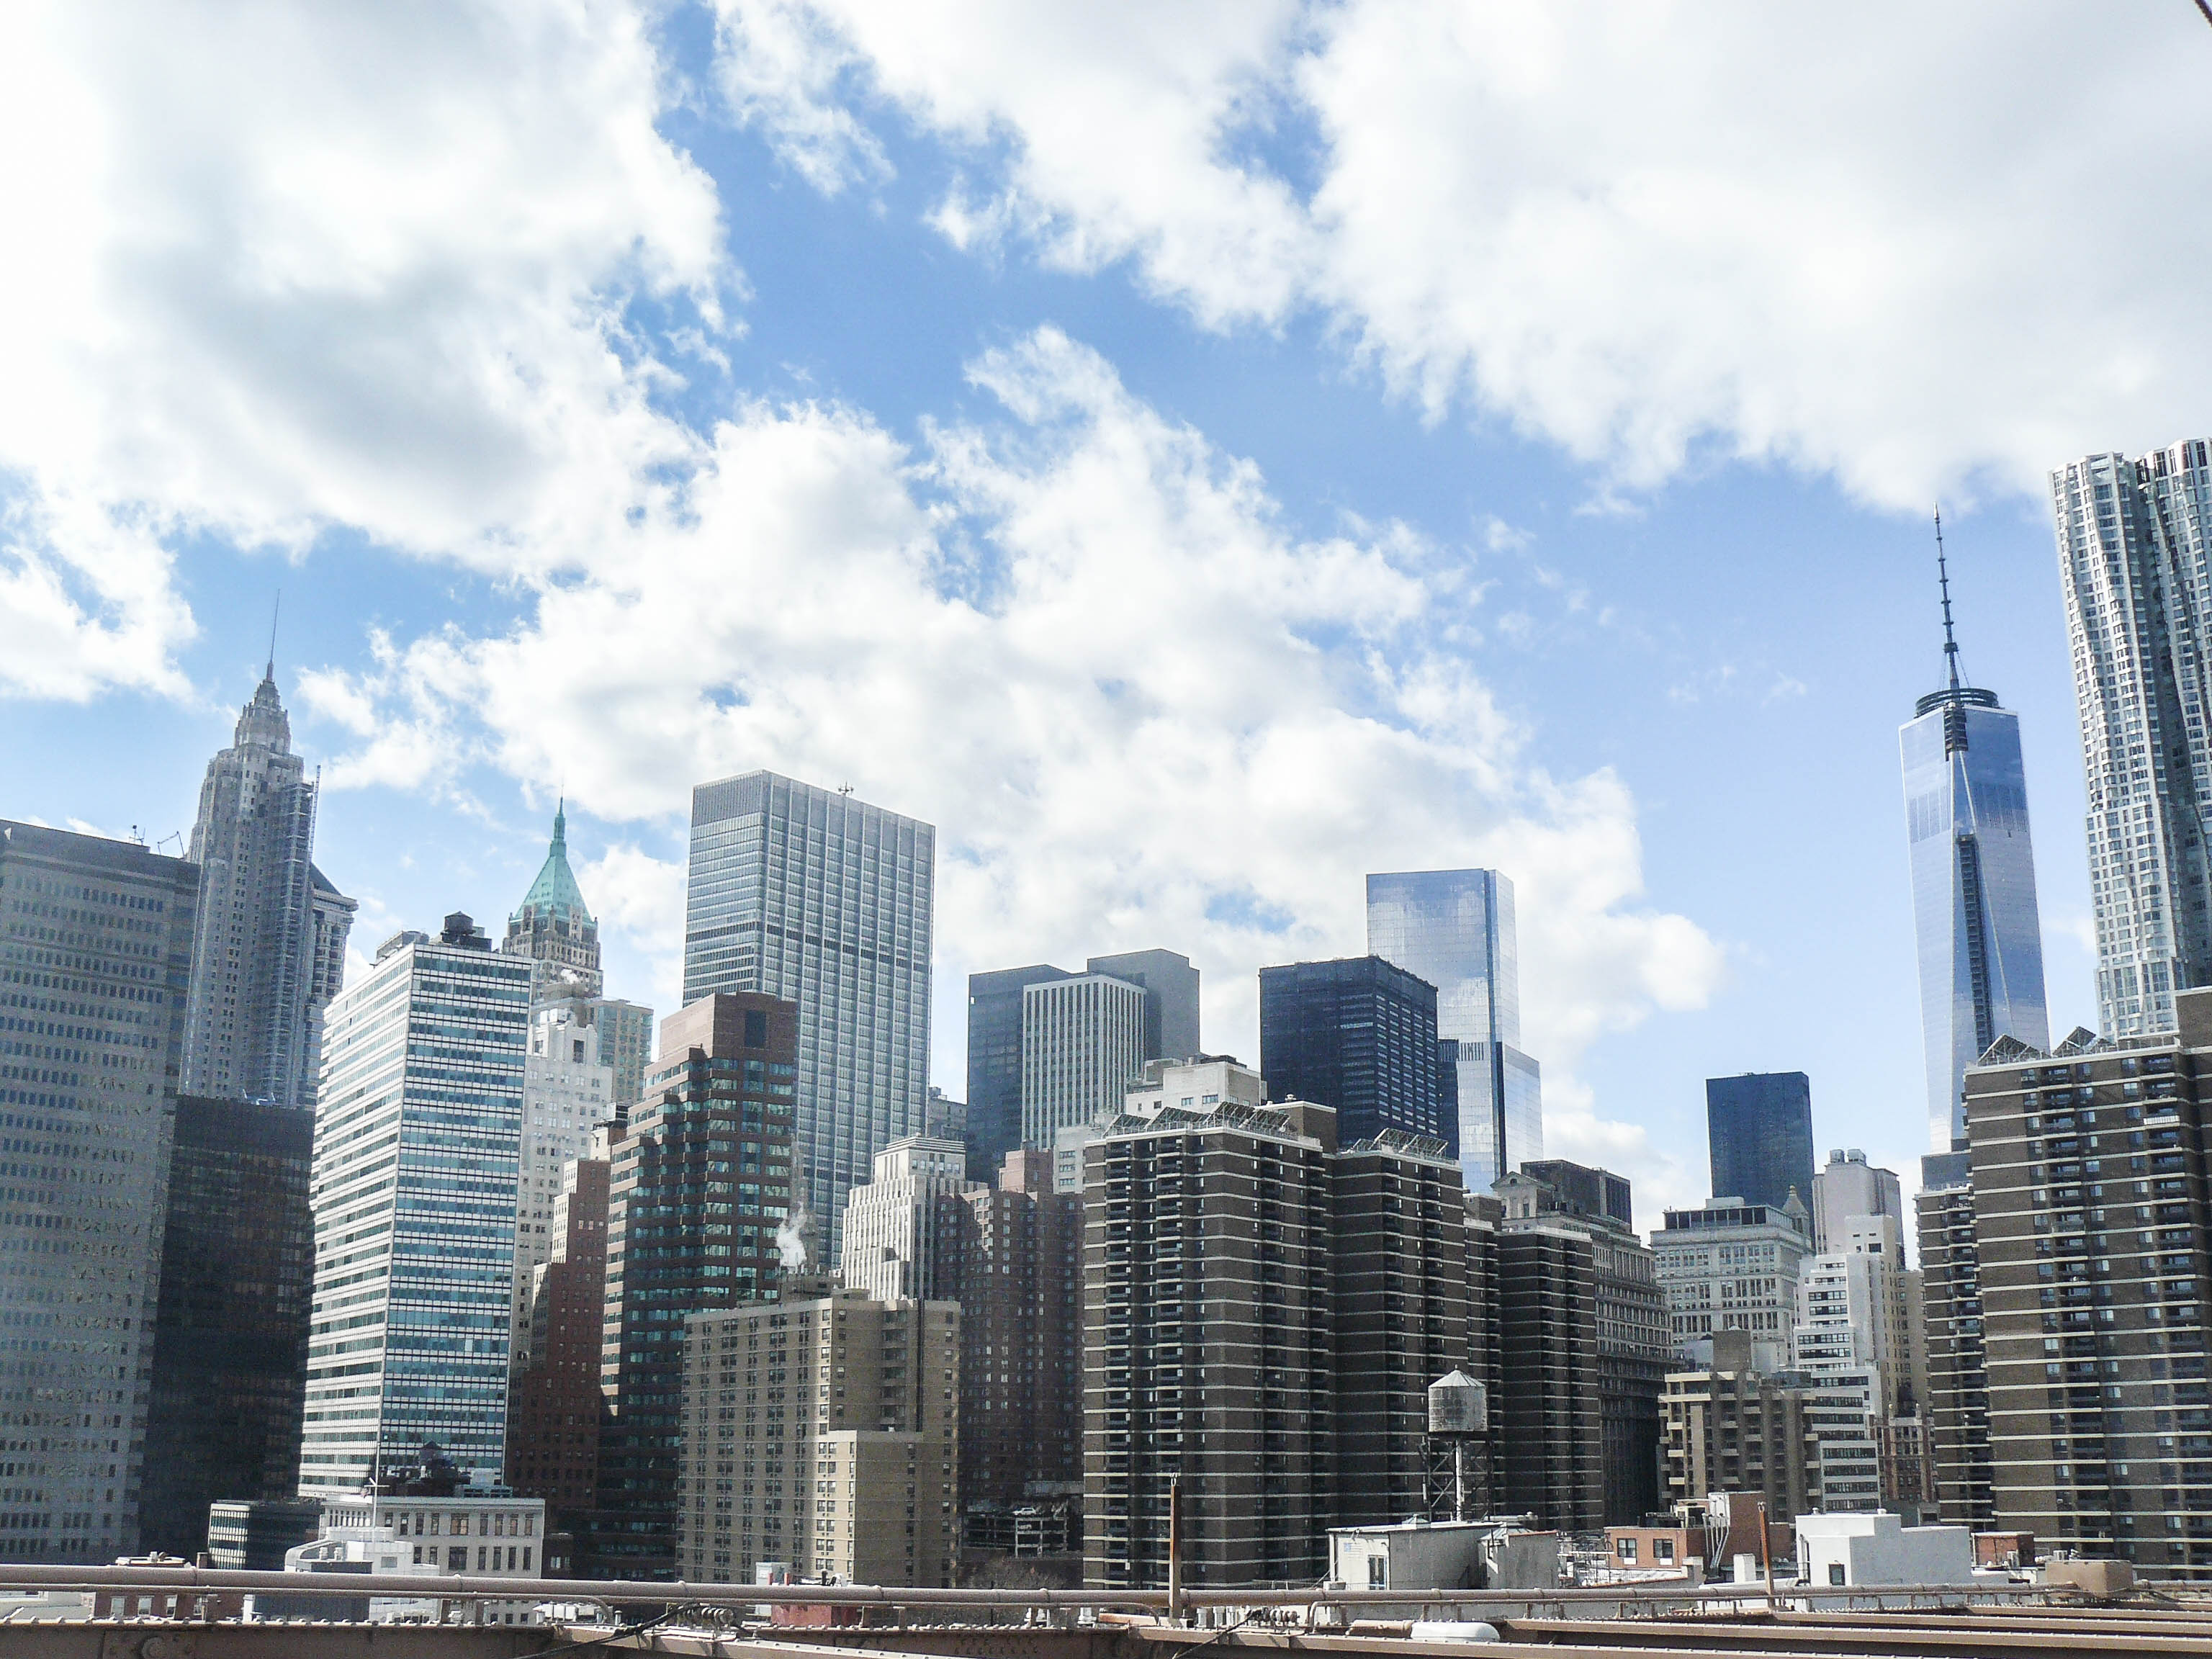 carnet-de-voyage-new-york-mademoisellevi-22